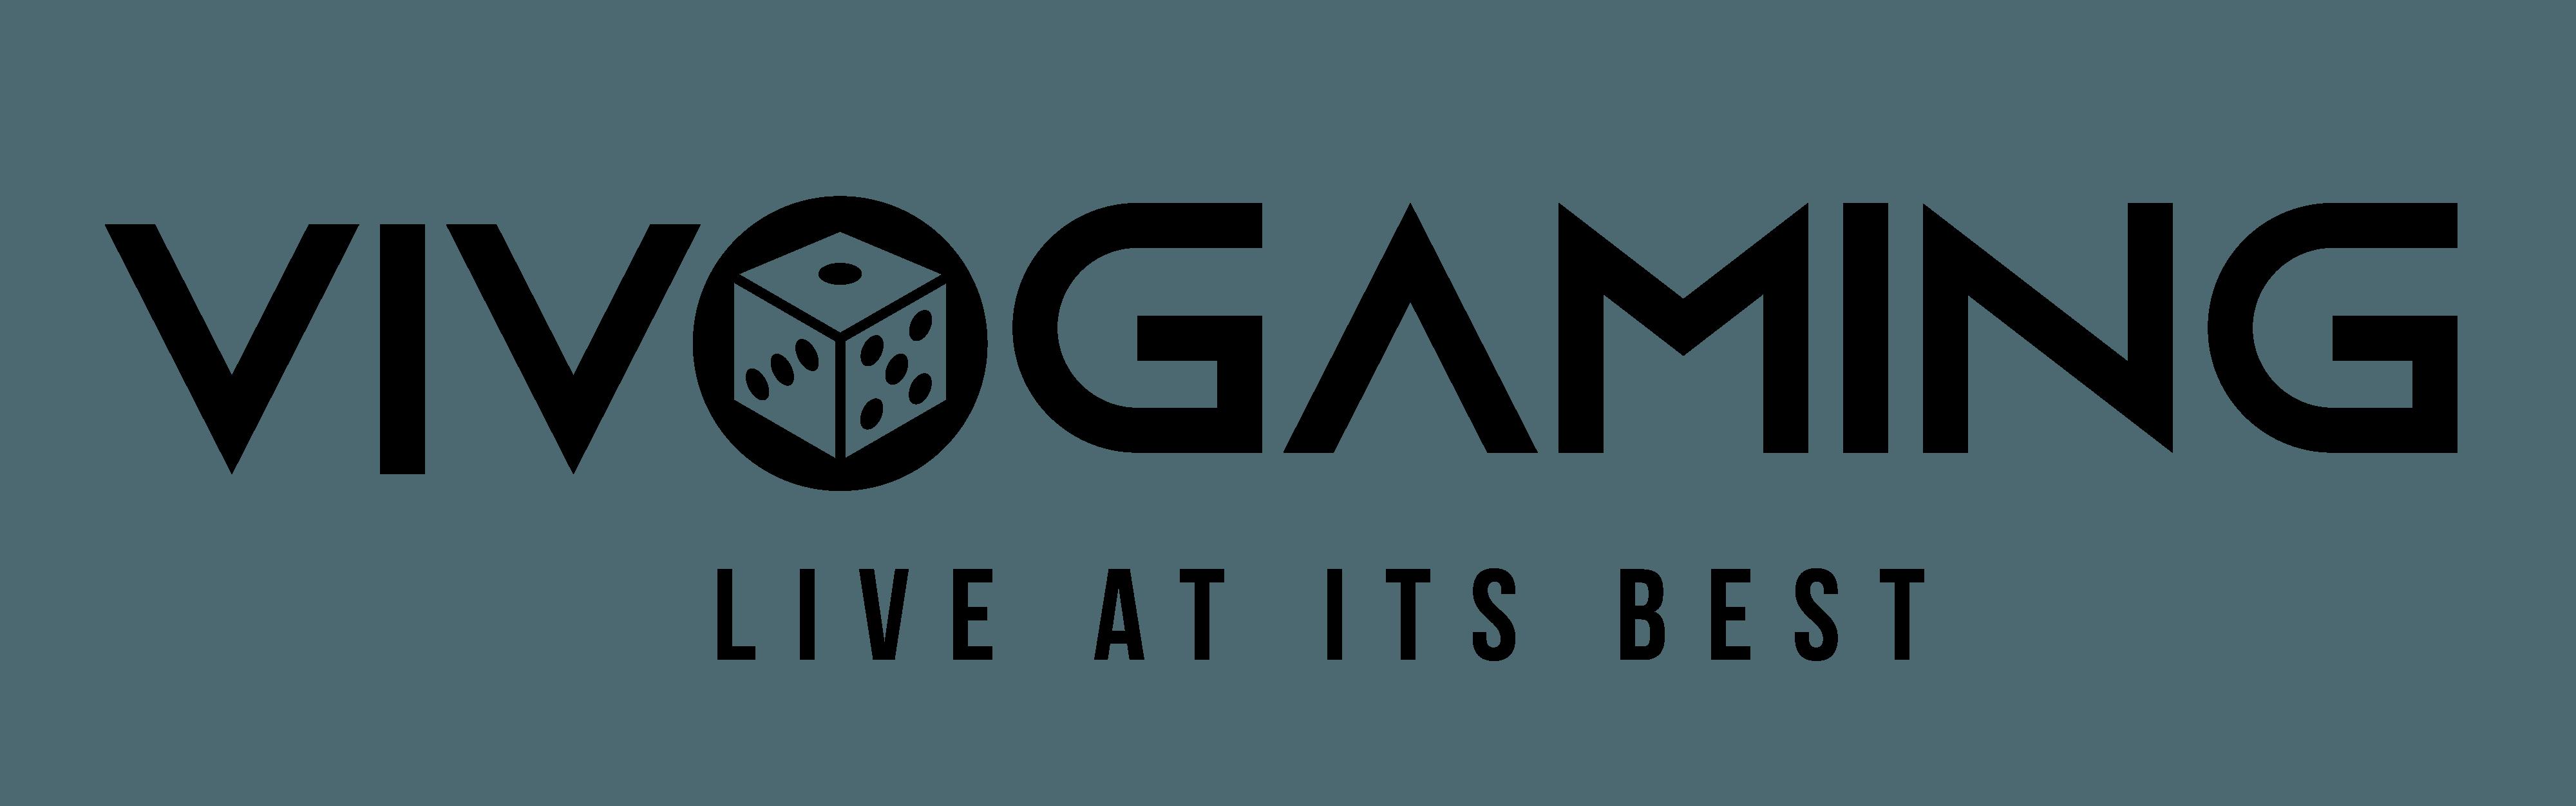 Vivo Gaming Spiele